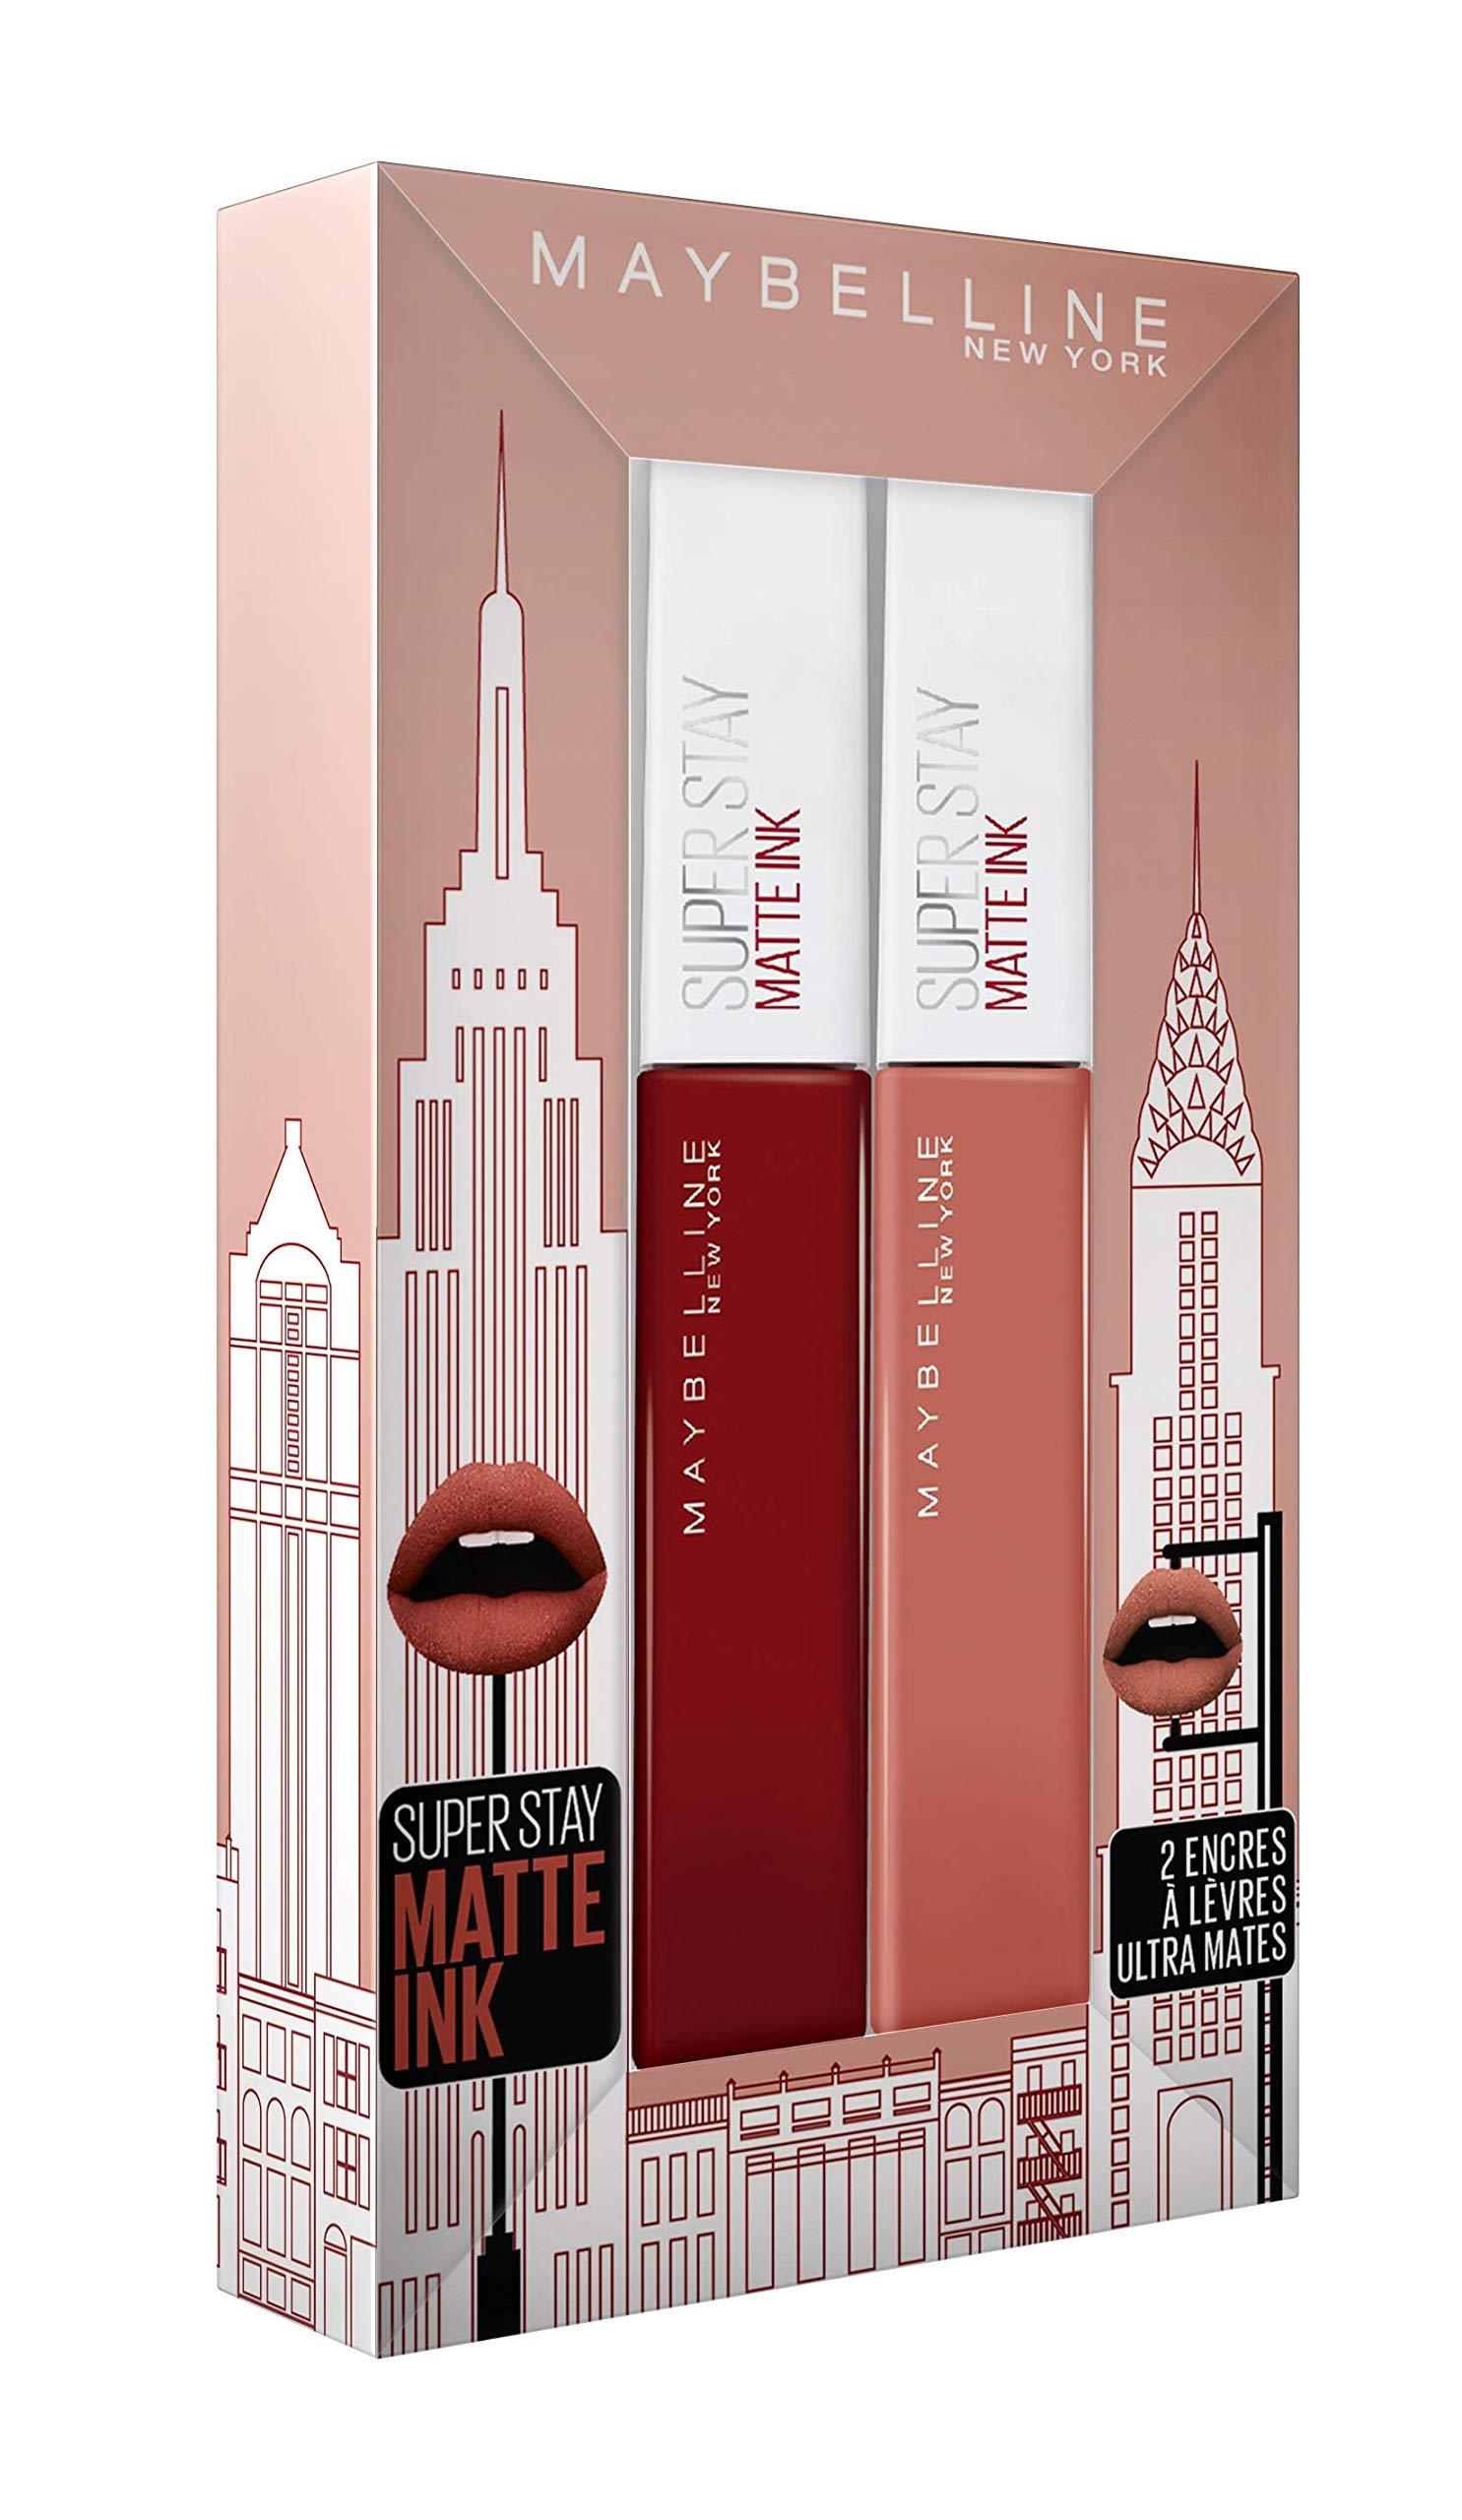 Maybelline New York regalo Superstay Matte Ink 50Voyager/70del Amazonas